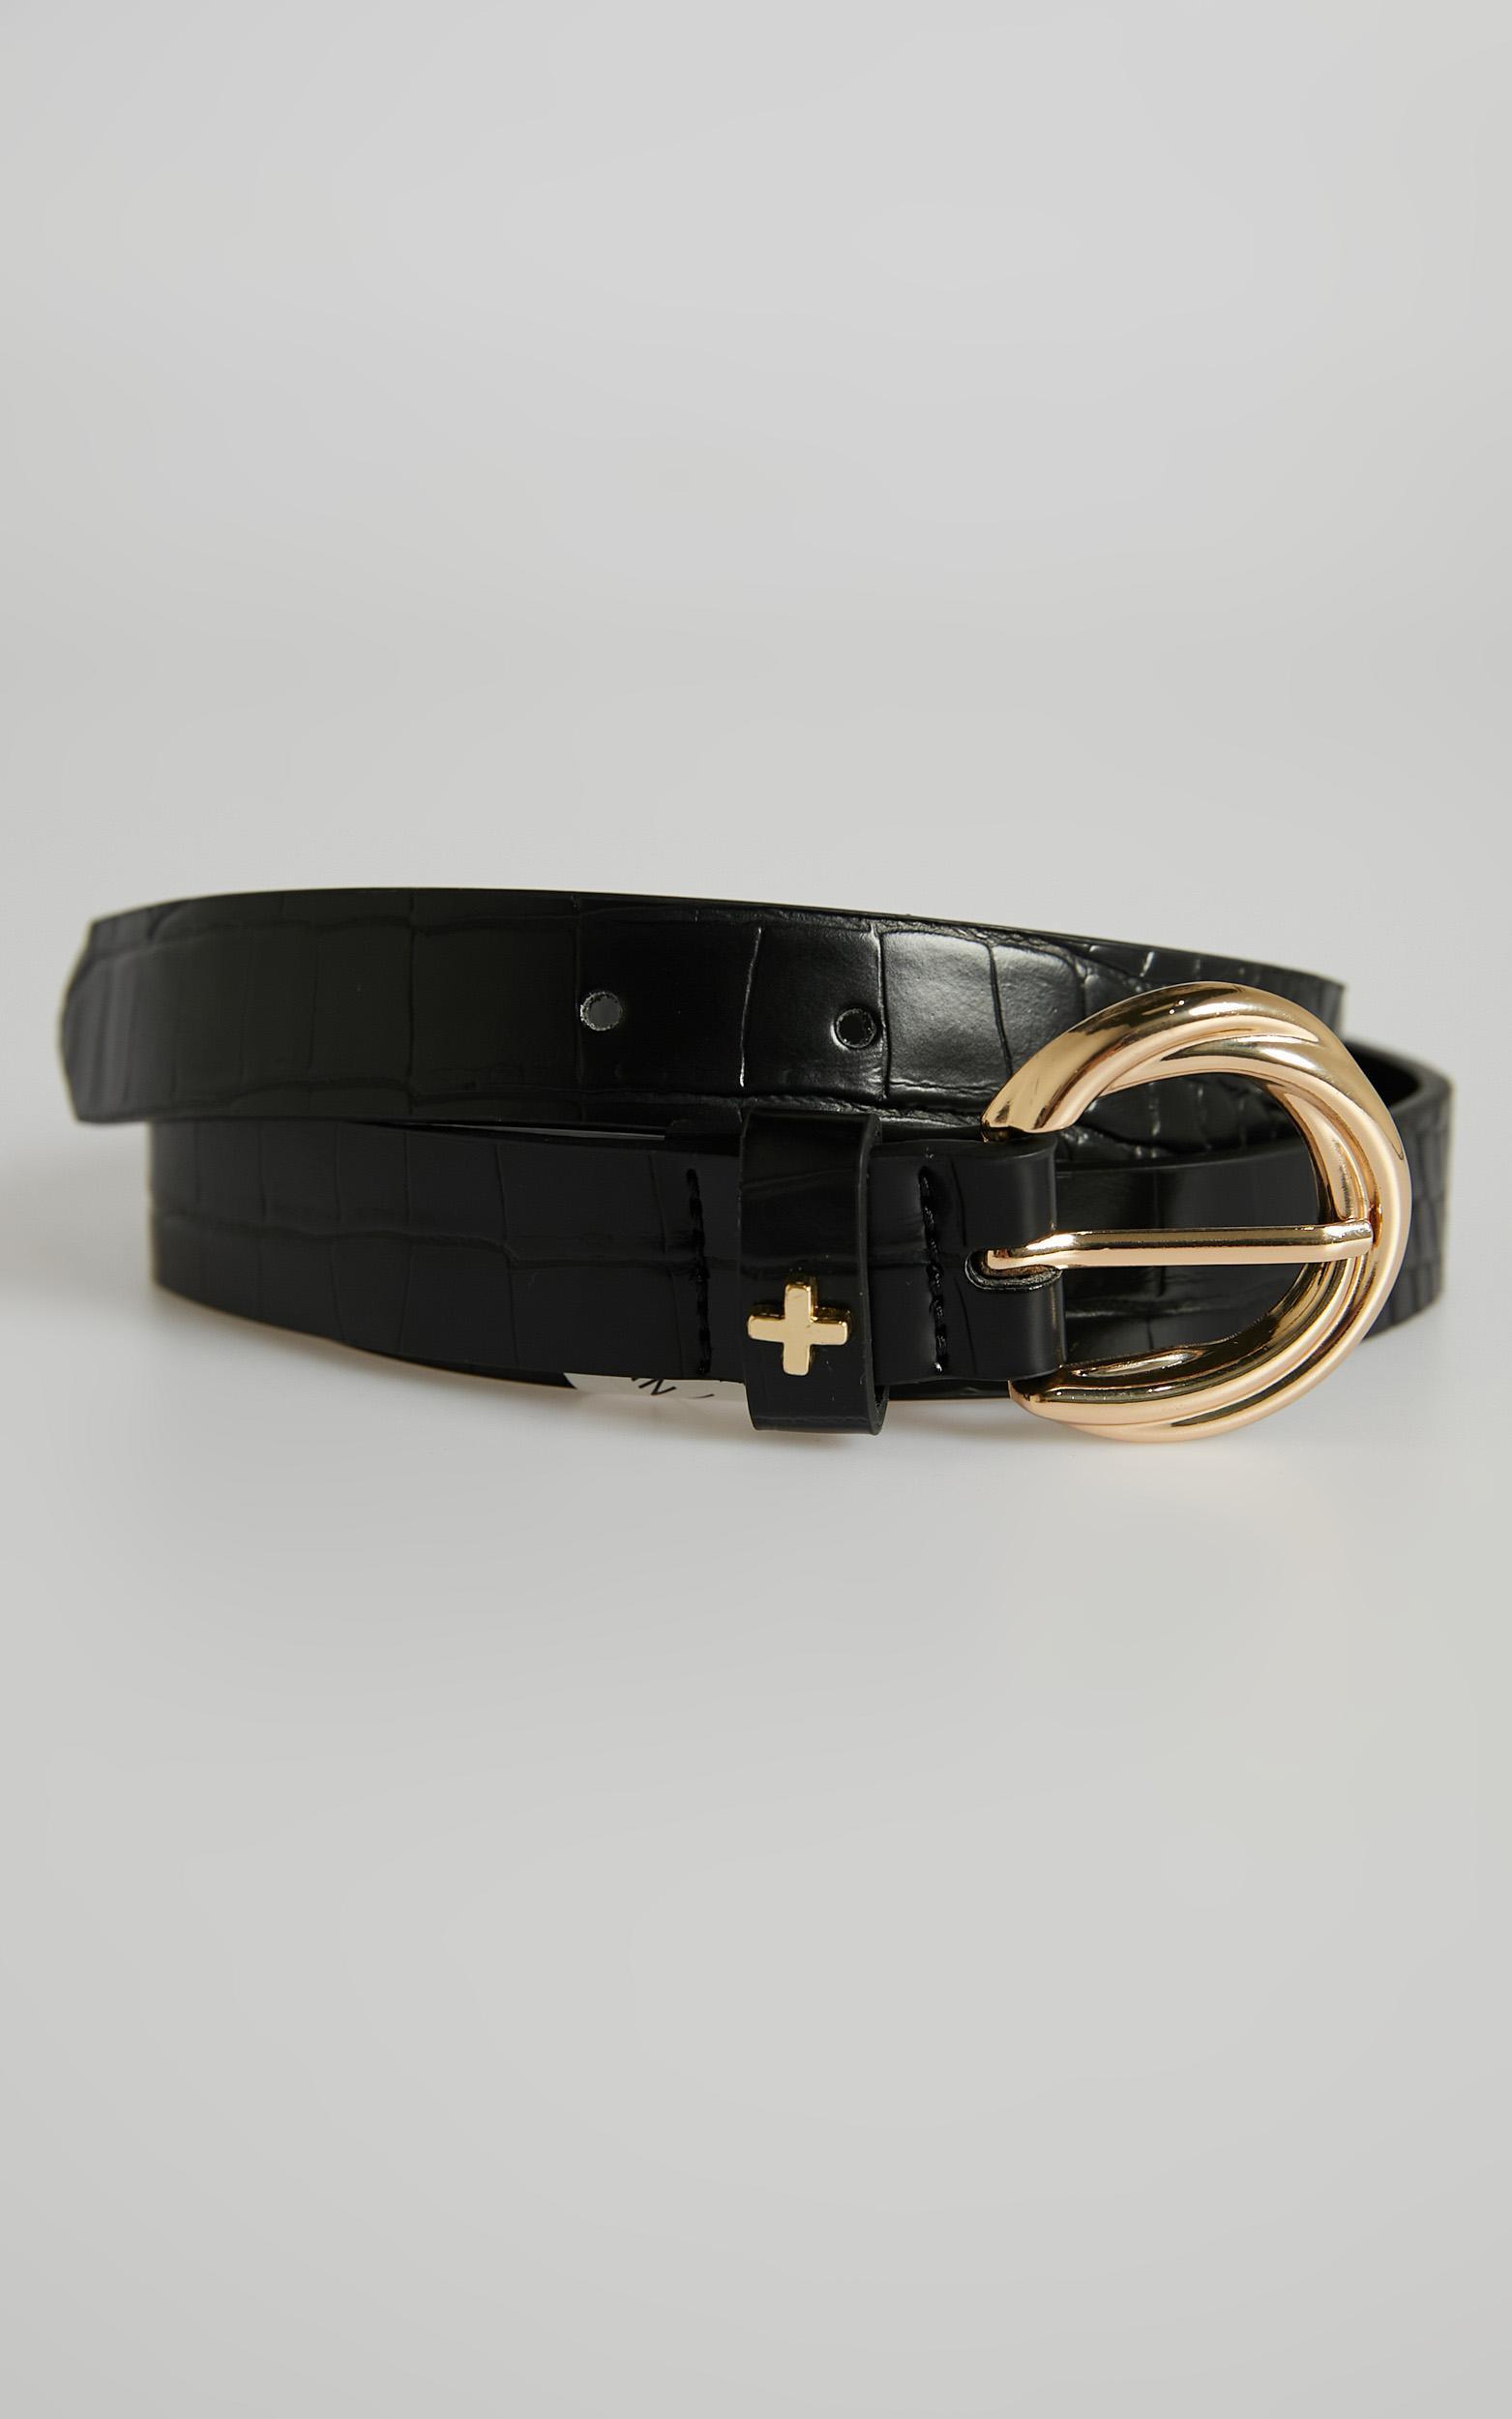 Peta and Jain - Alexis Belt in Black Gold, Black, hi-res image number null